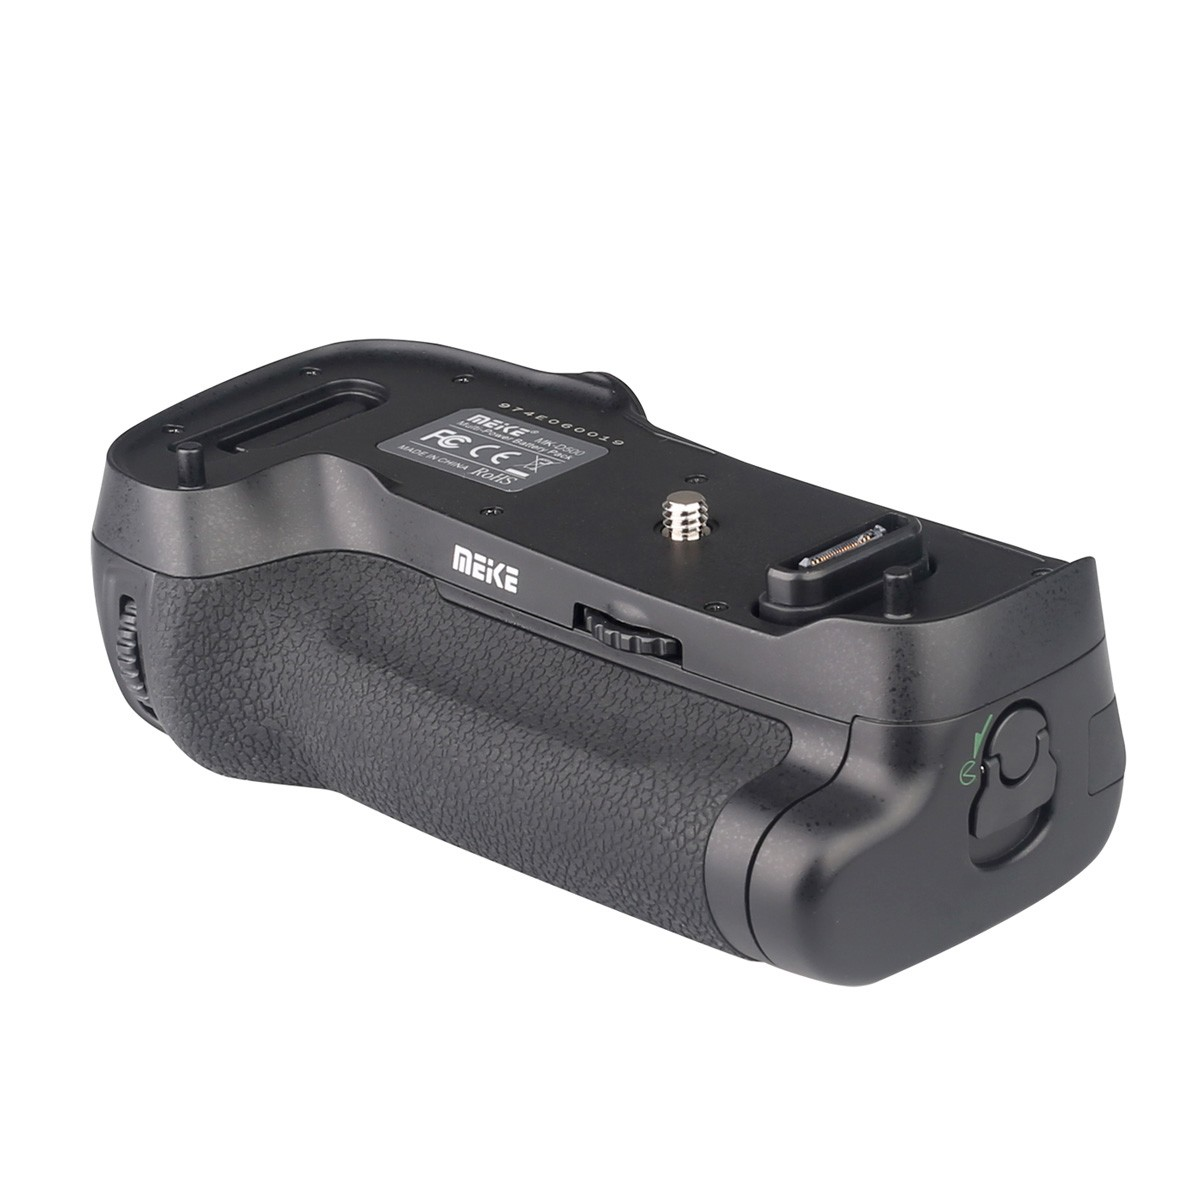 Meike MK-D500 Pro 2.4G Hz Remote Control Shooting For Nikon D500 Camera Replacement Of MB-D17 + 2PCS EN-EL15 Battery + Charger